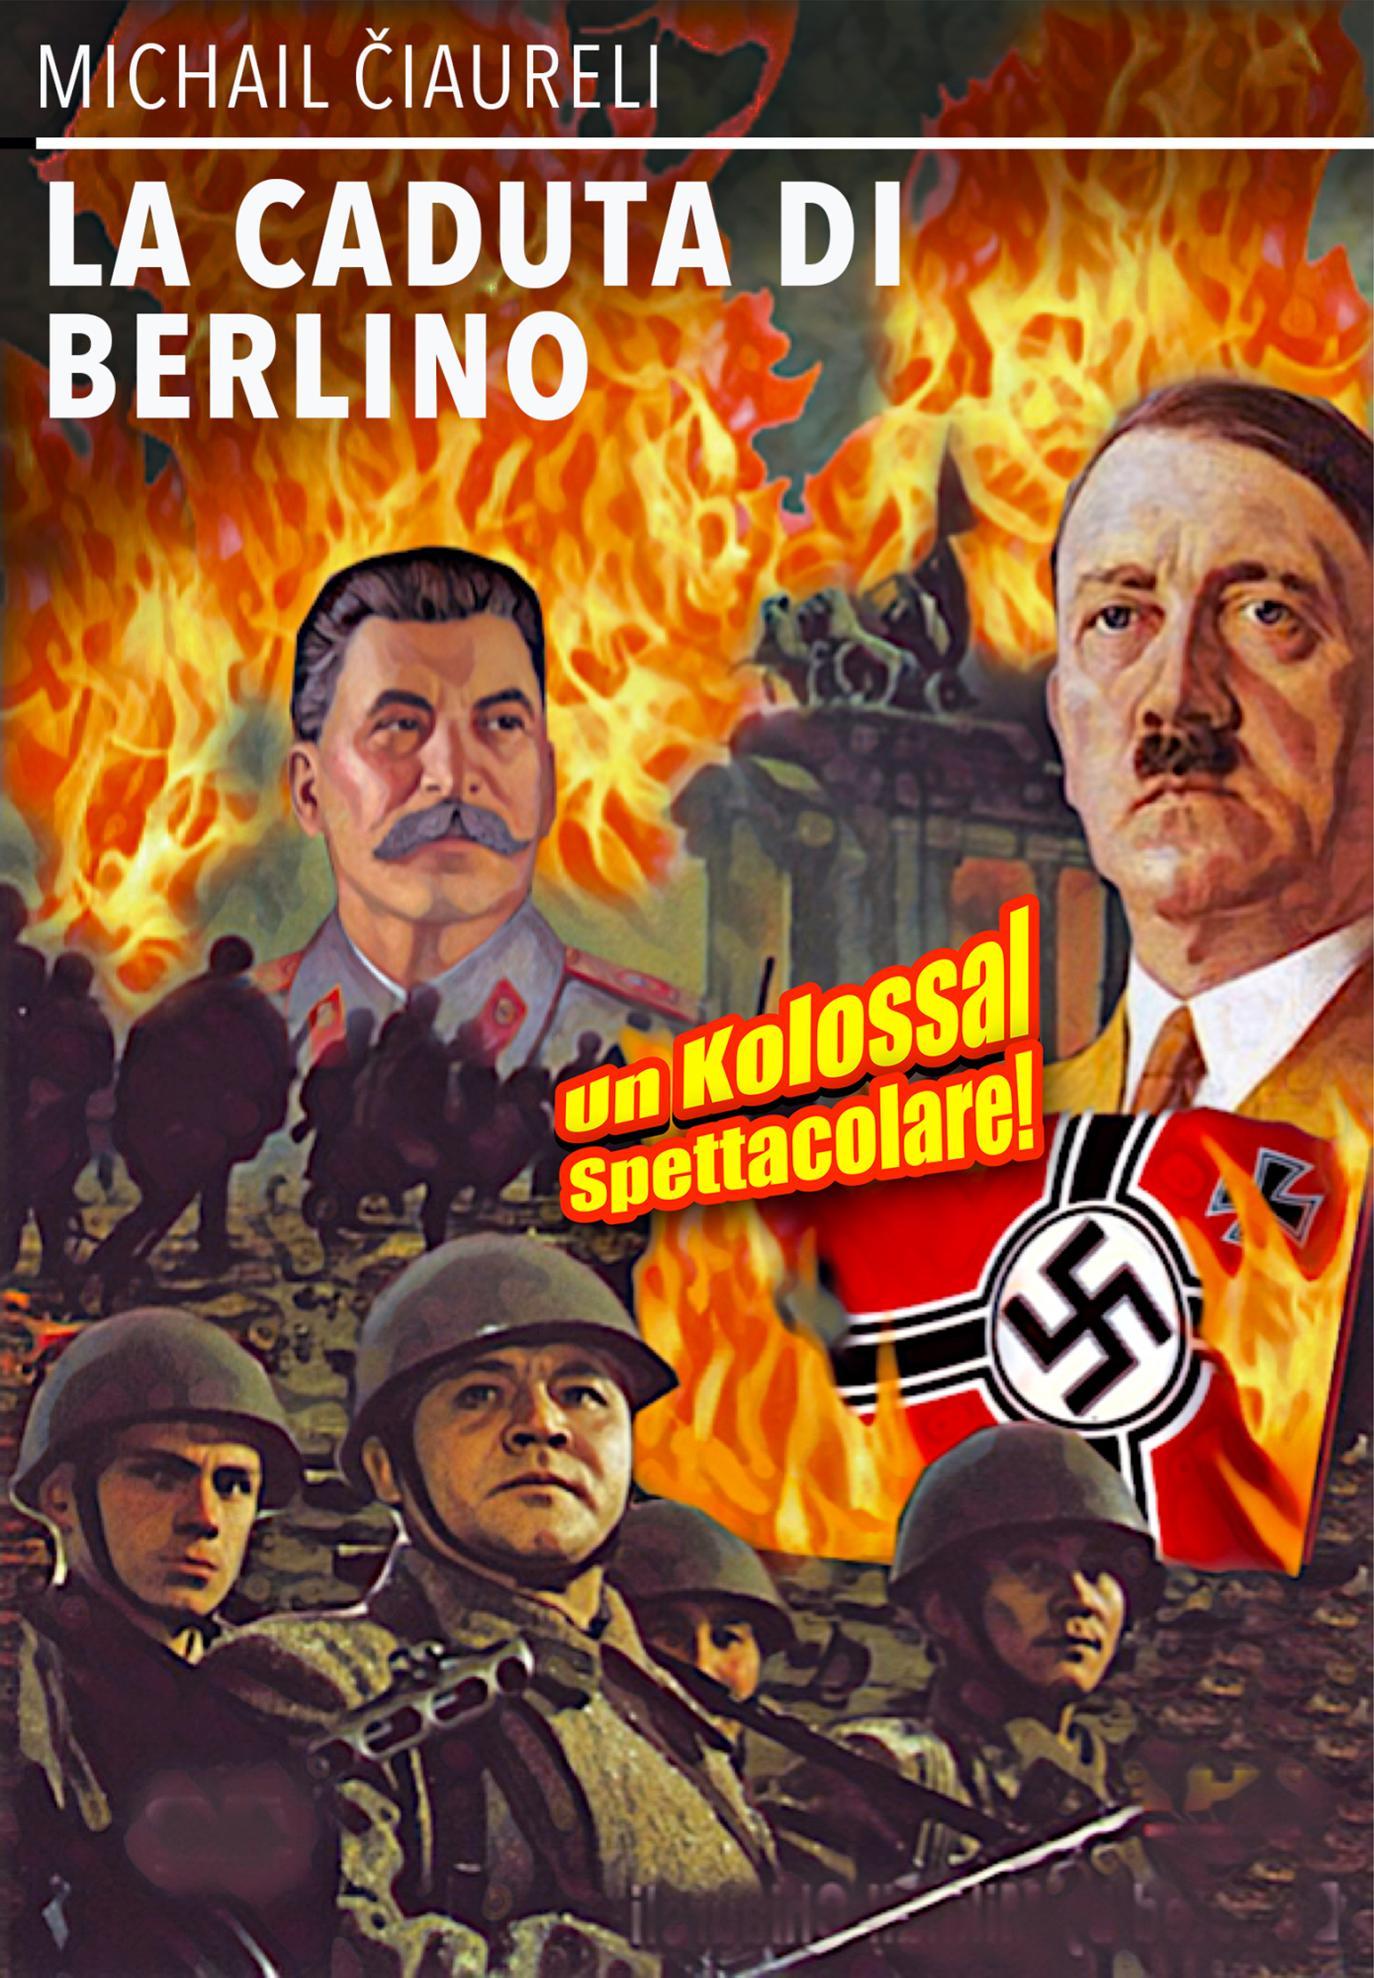 LA CADUTA DI BERLINO (DVD)